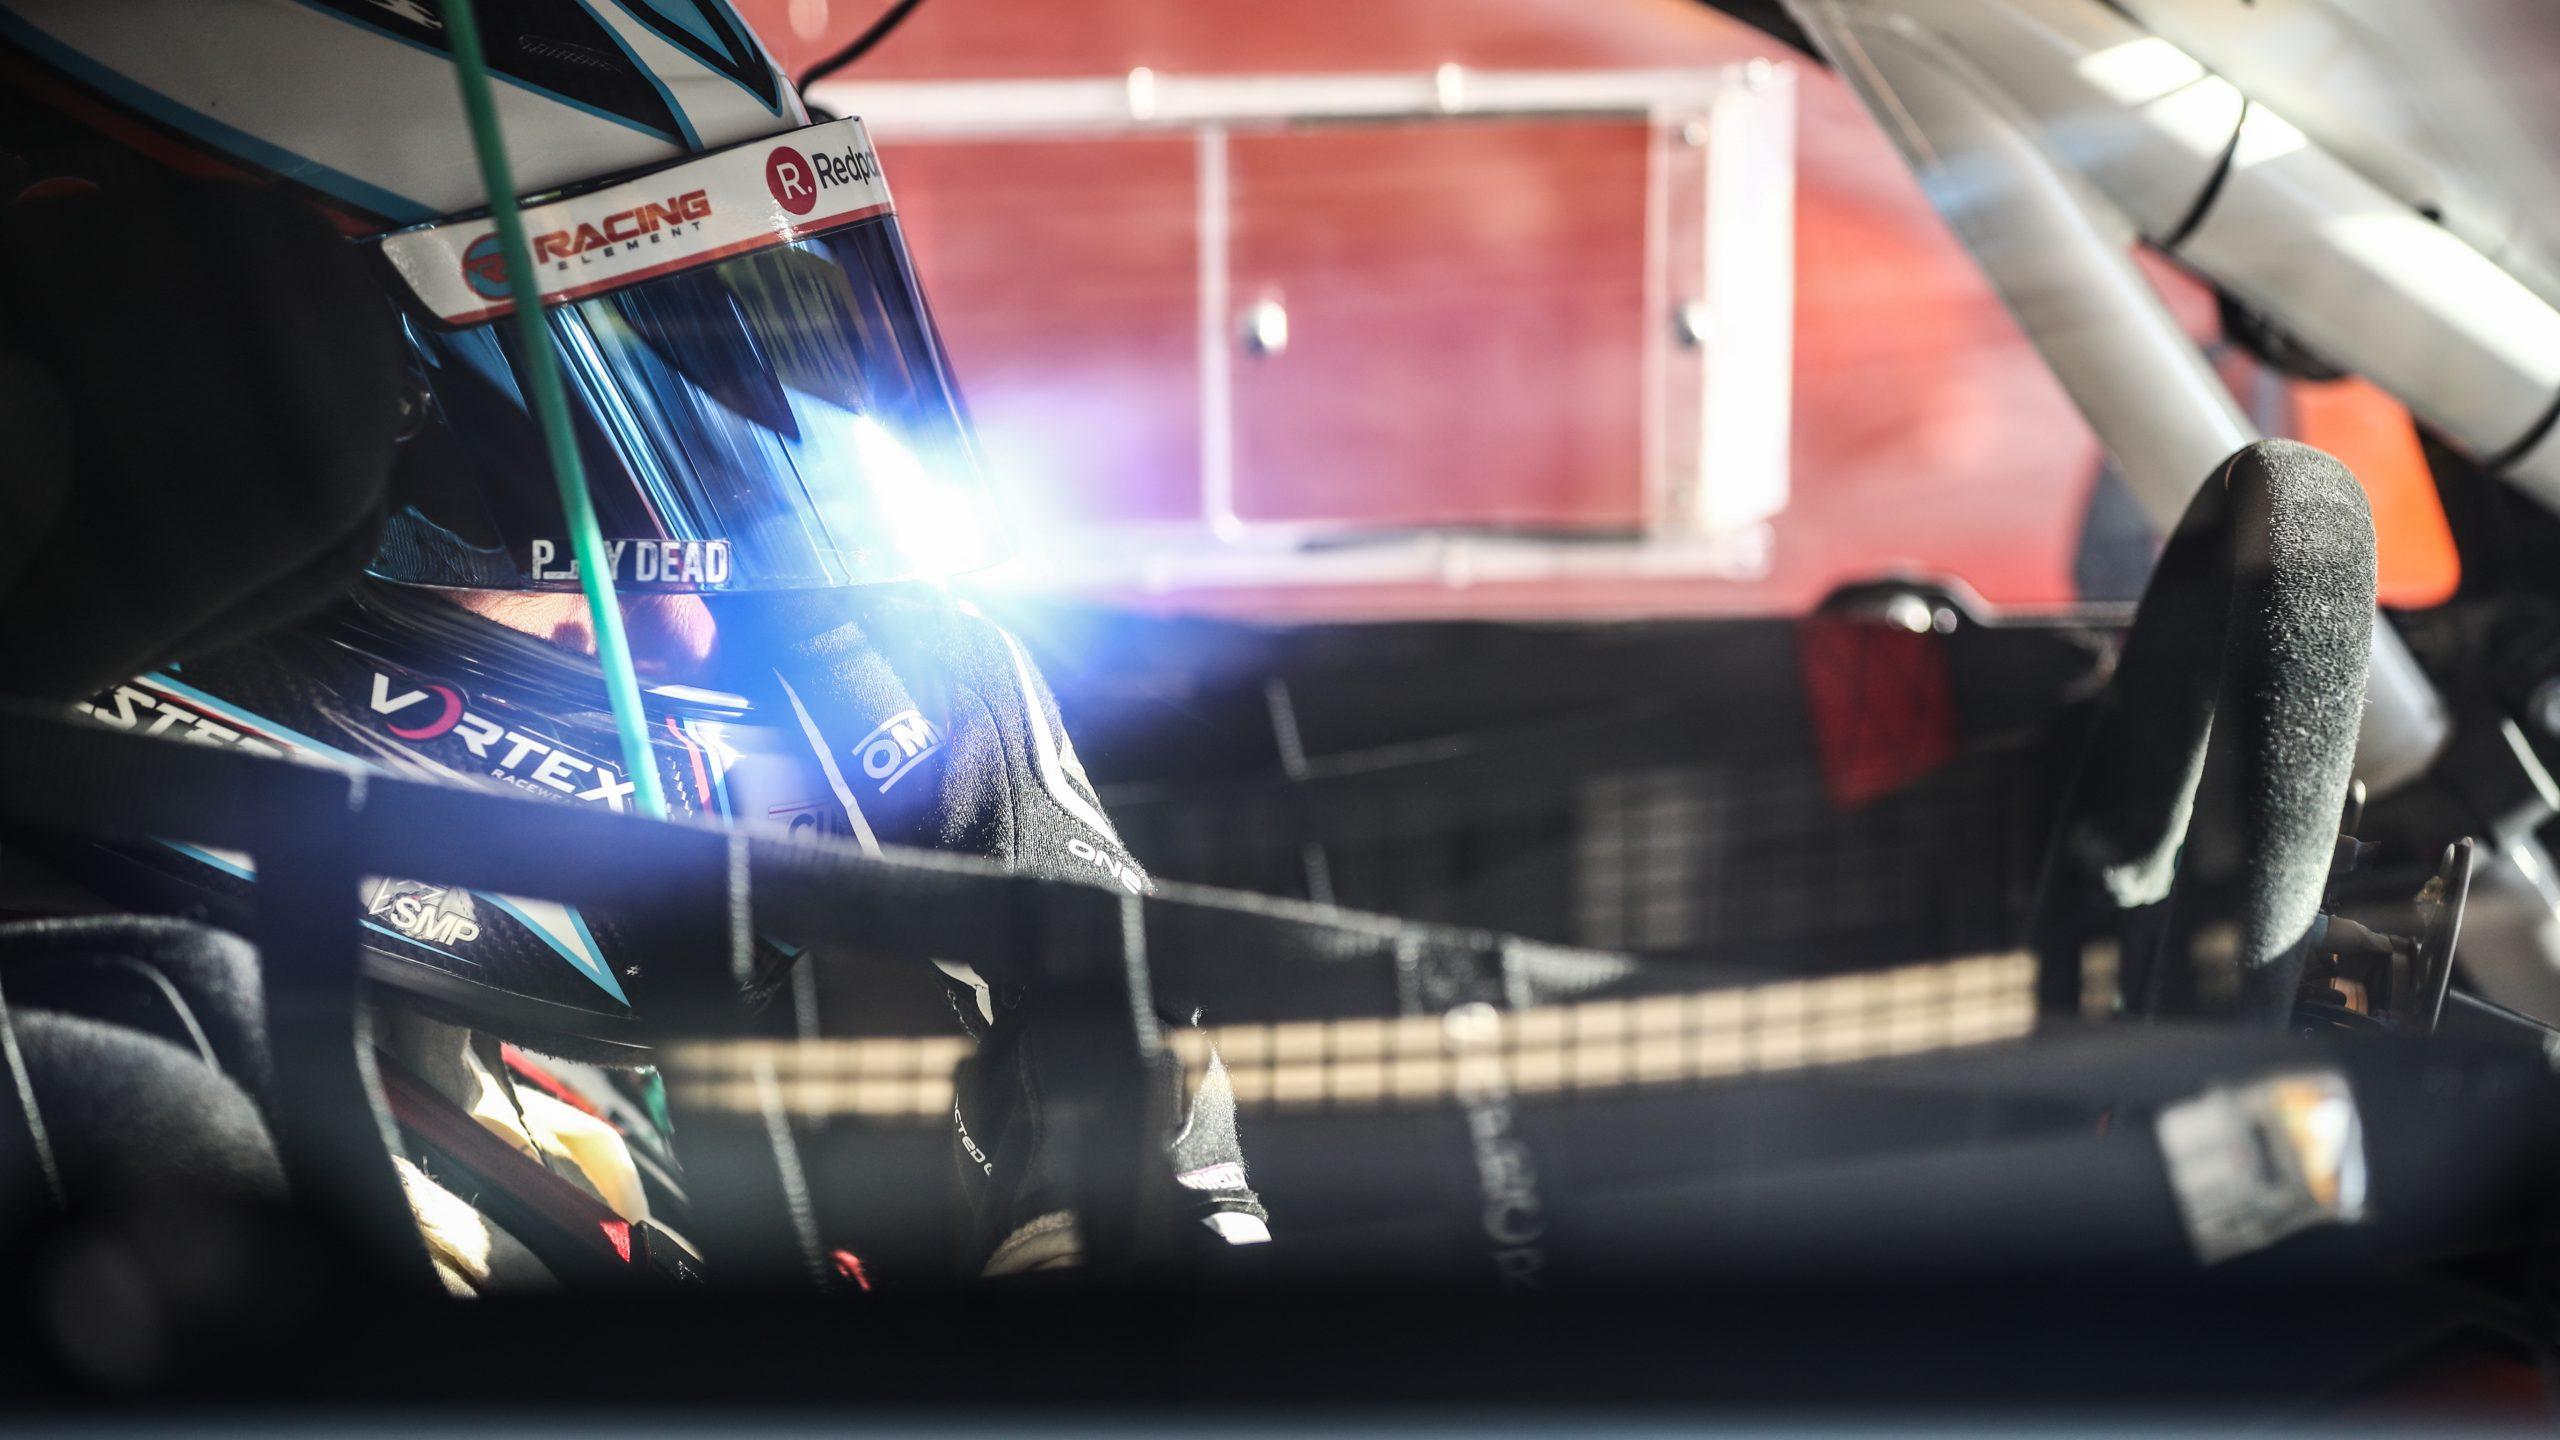 Jono Lester inside the Gulf Racing Porsche